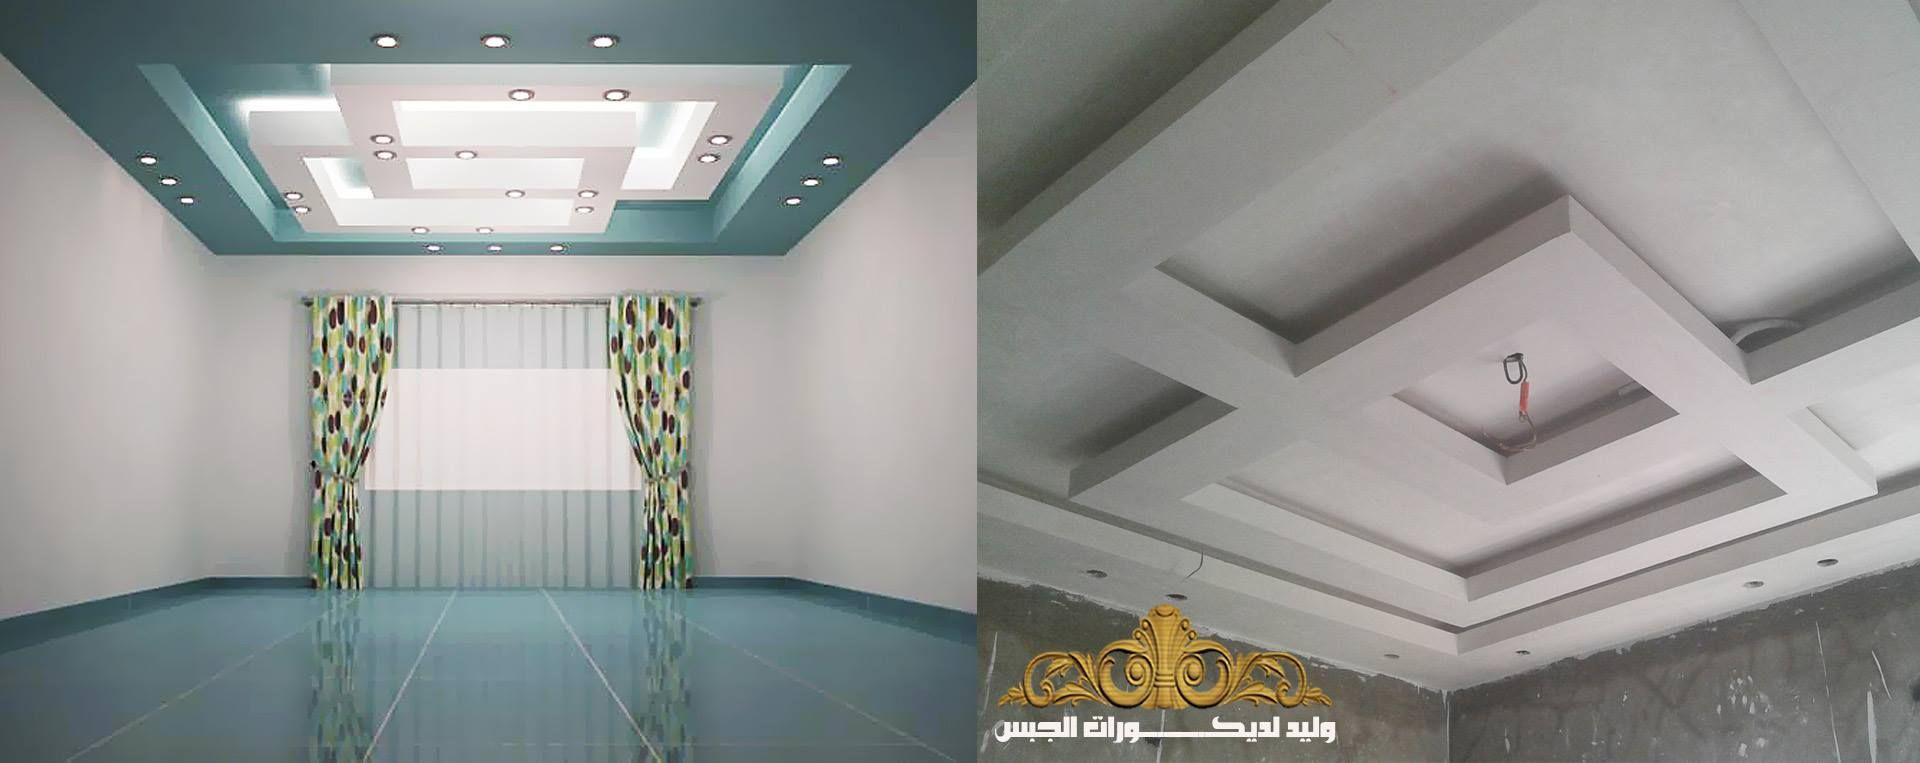 https://www.facebook.com/gypsum.mansoura/photos/a.1619015735090196.1073741828.1619010011757435/1619975281660908/?type=3&theater